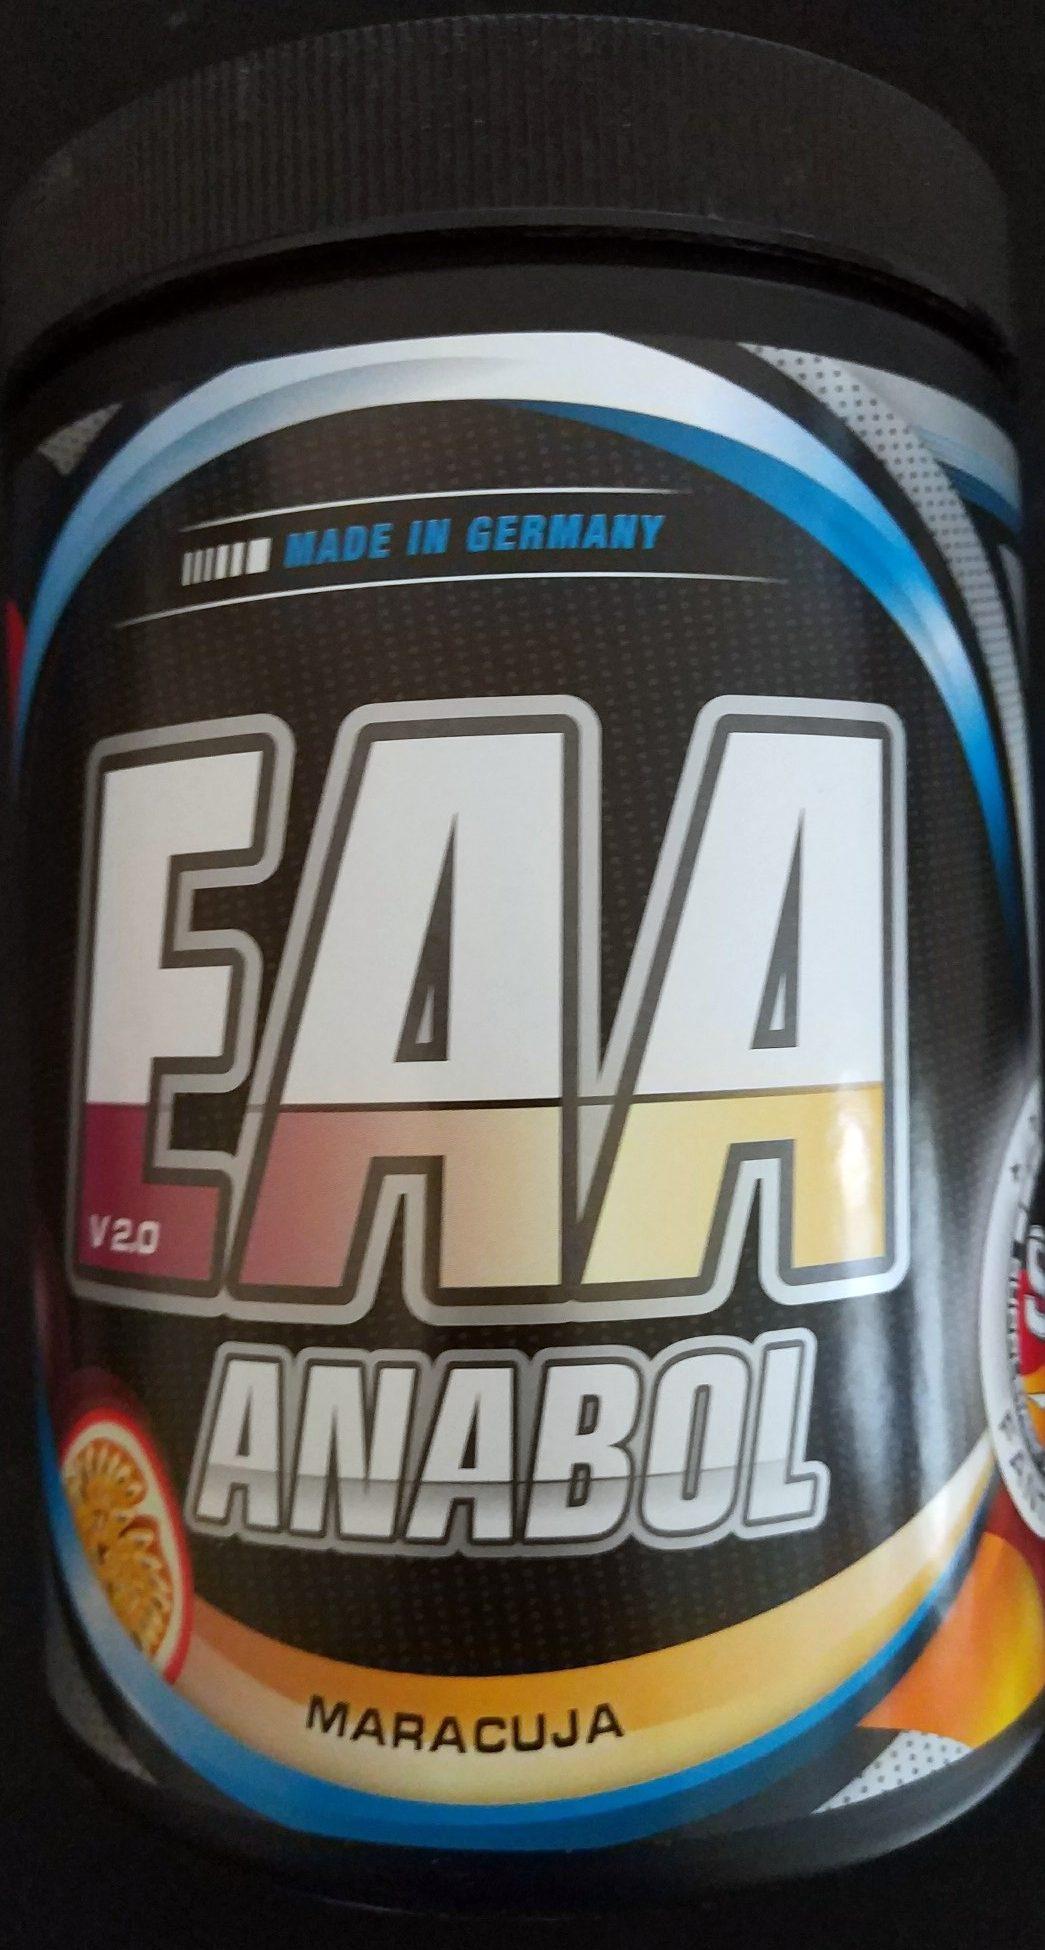 EAA Anabol Maracuja - Product - de